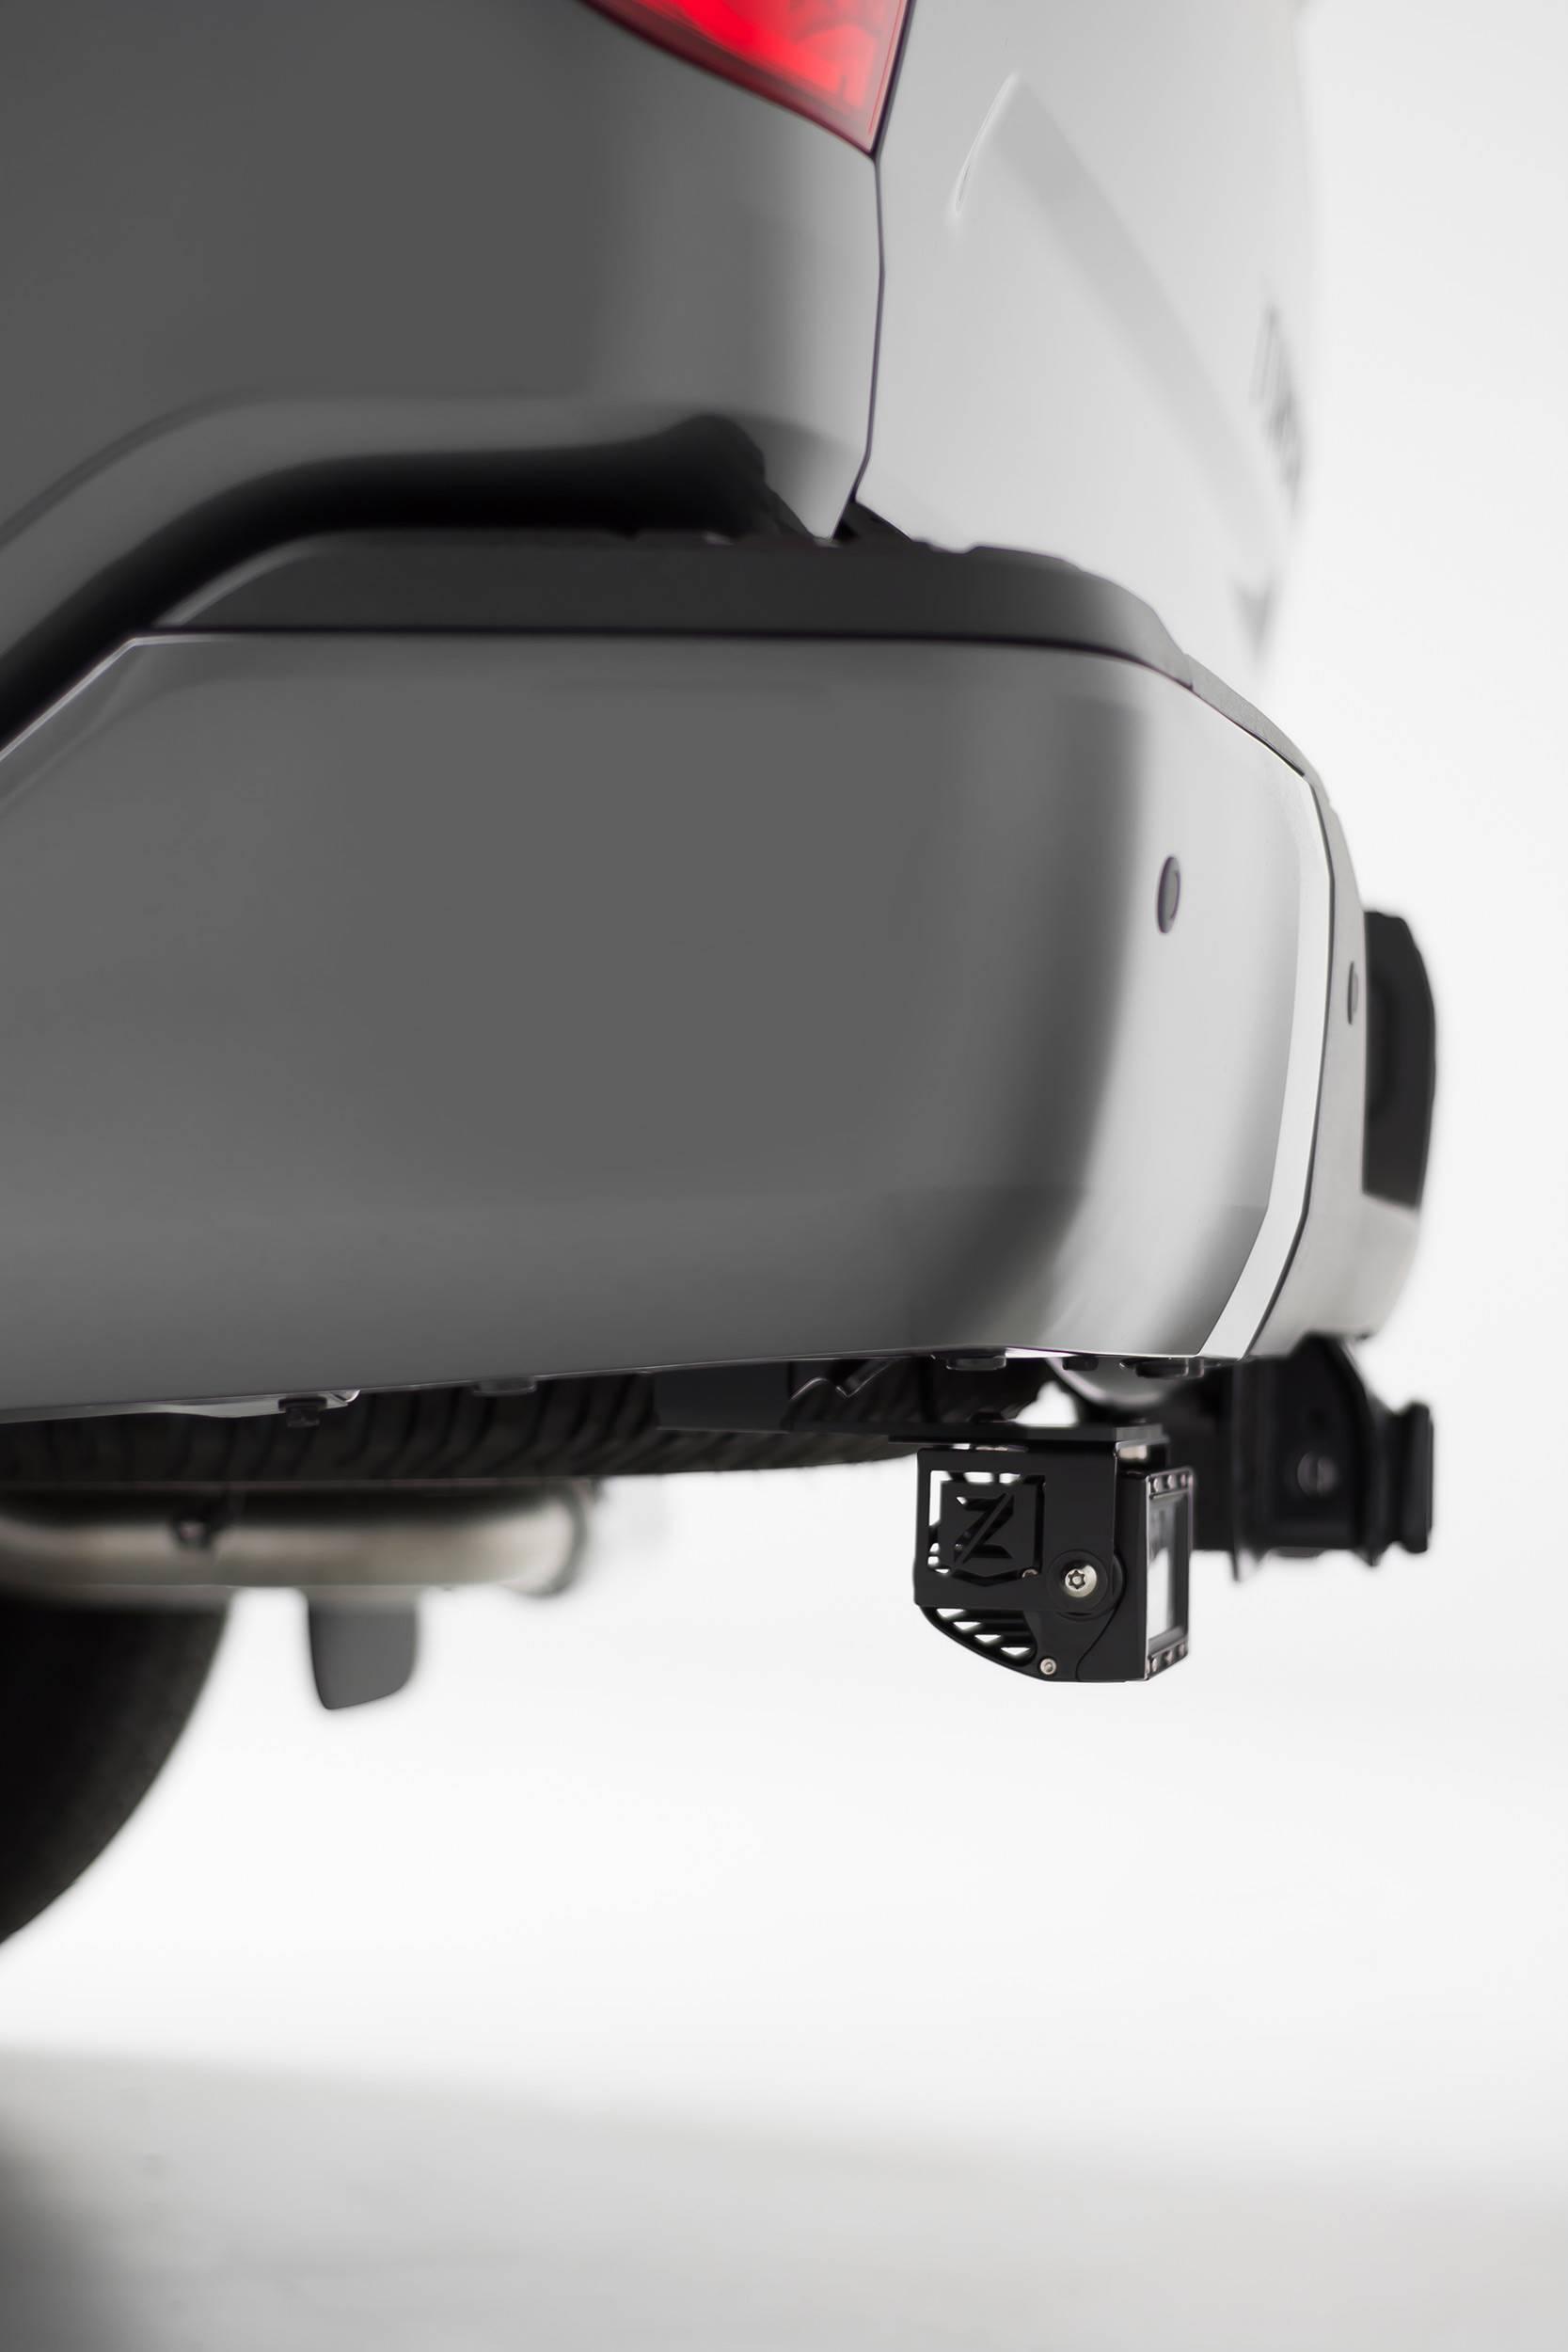 ZROADZ - 2014-2021 Toyota Tundra Rear Bumper LED Bracket to mount (2) 6 Inch Straight Light Bar - PN #Z389641